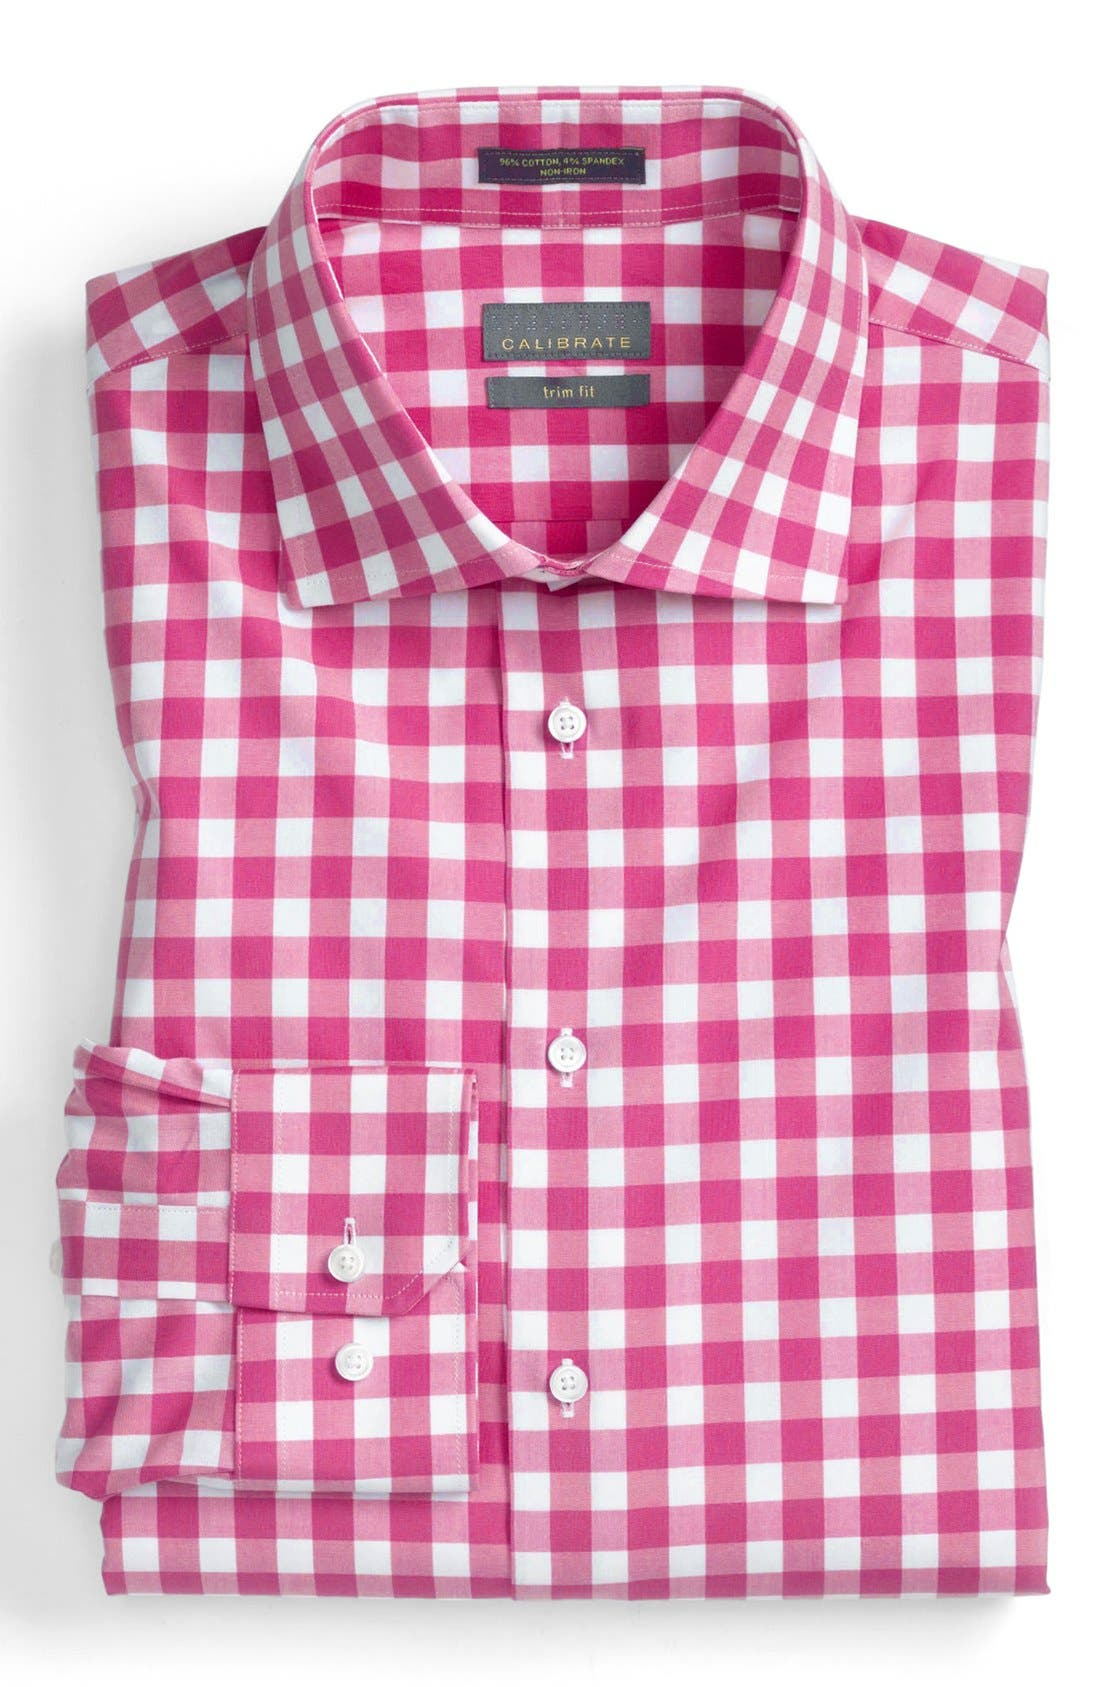 Alternate Image 1 Selected - Calibrate Trim Fit Non-Iron Gingham Dress Shirt